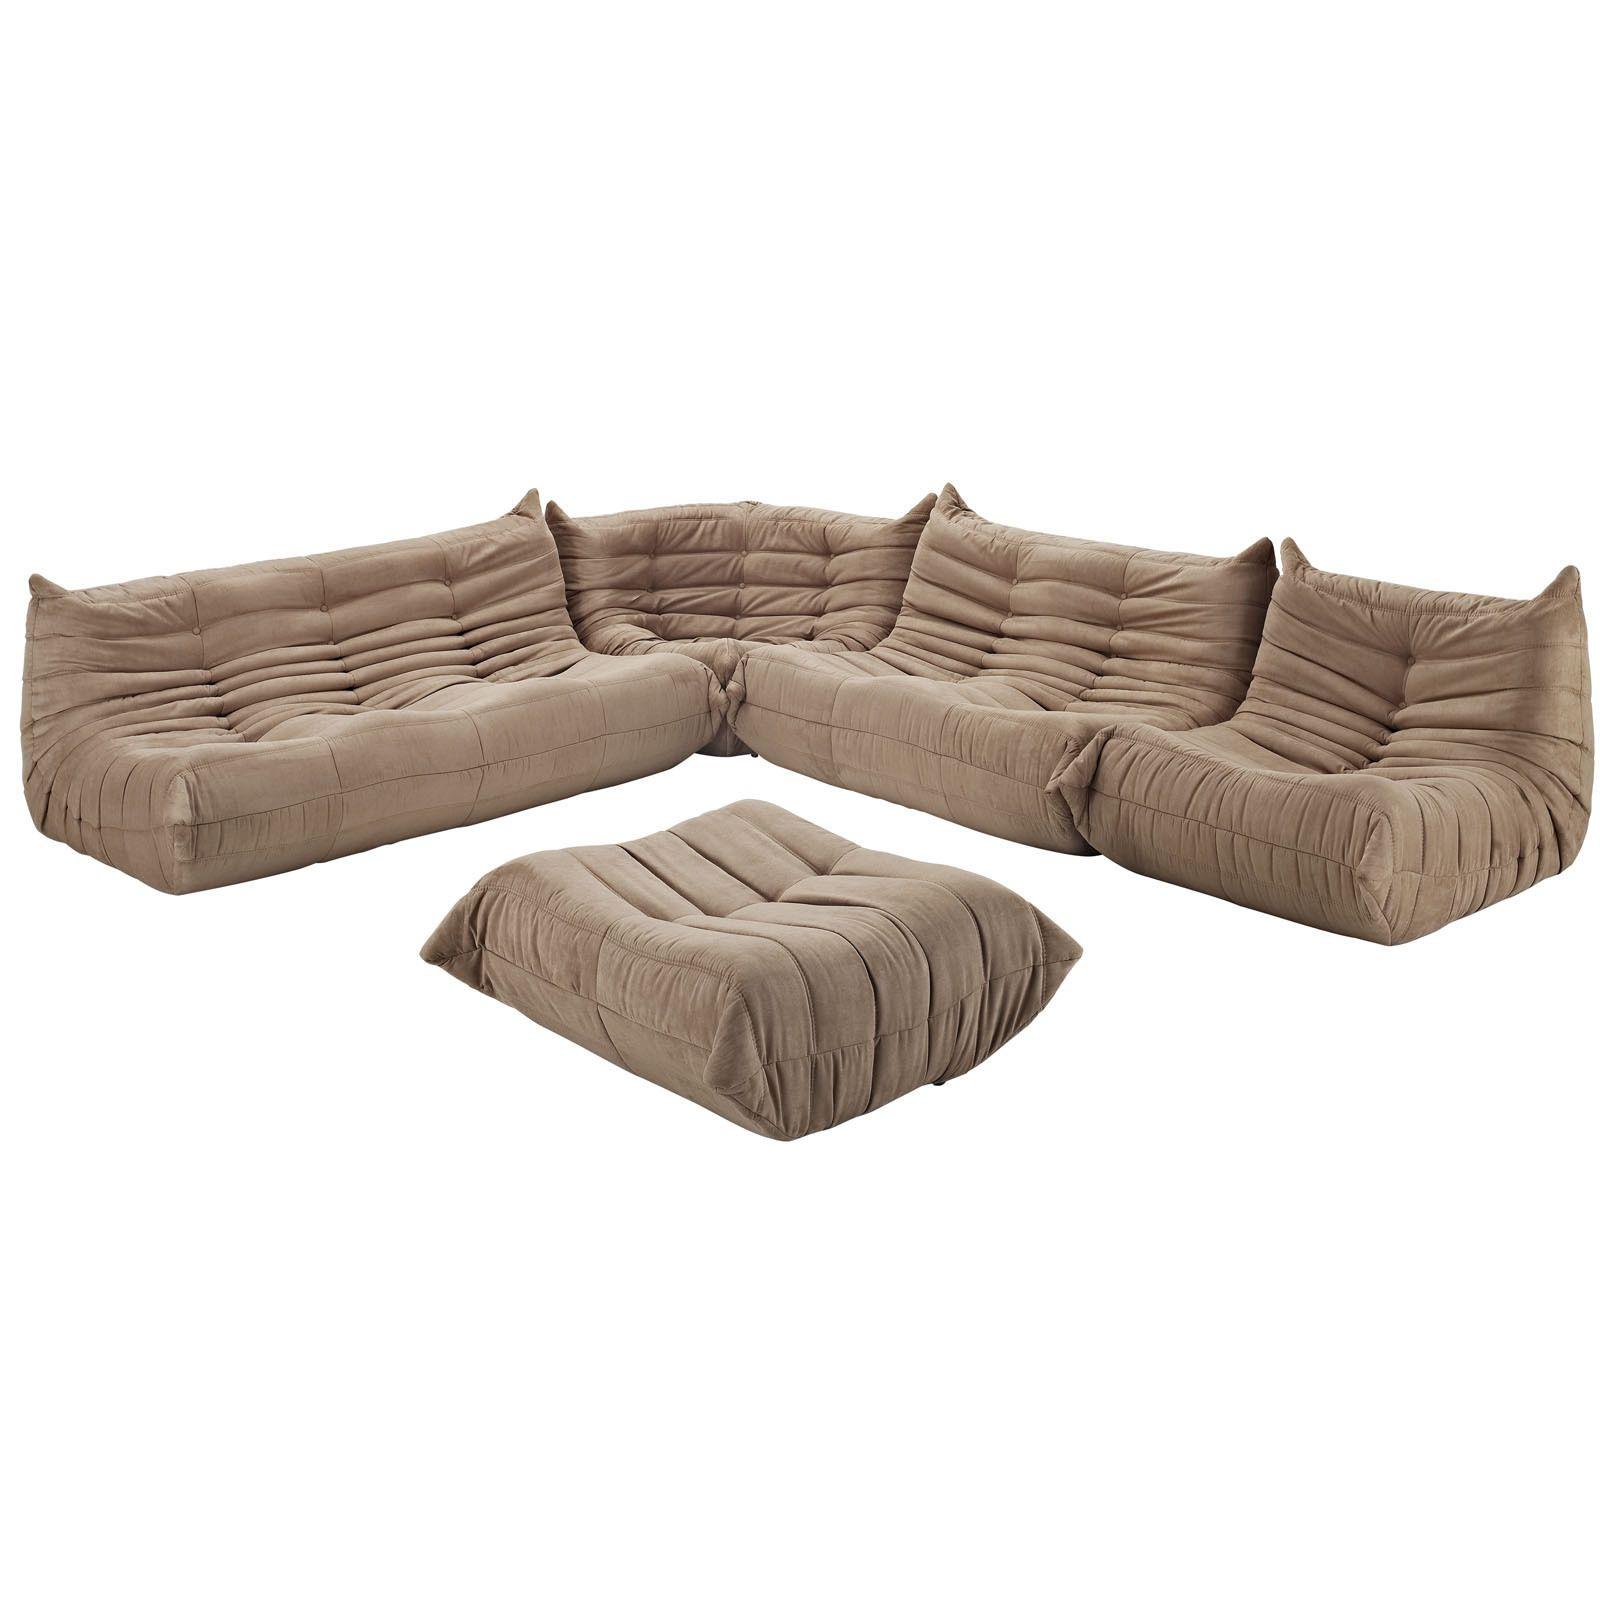 Waverunner Modular Sectional Sofa Set 5 piece by Modway